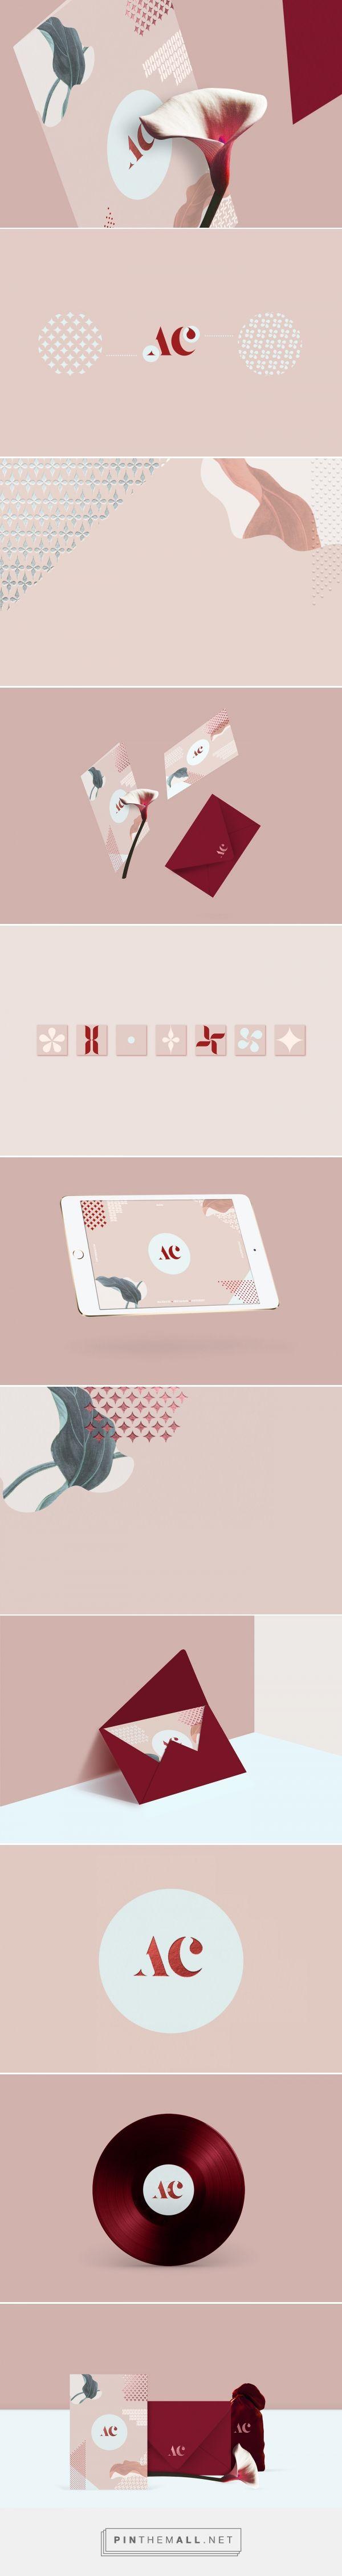 AC Branding by Maria Hdez on Behance | Fivestar Branding – Design and Branding Agency & Inspiration Gallery